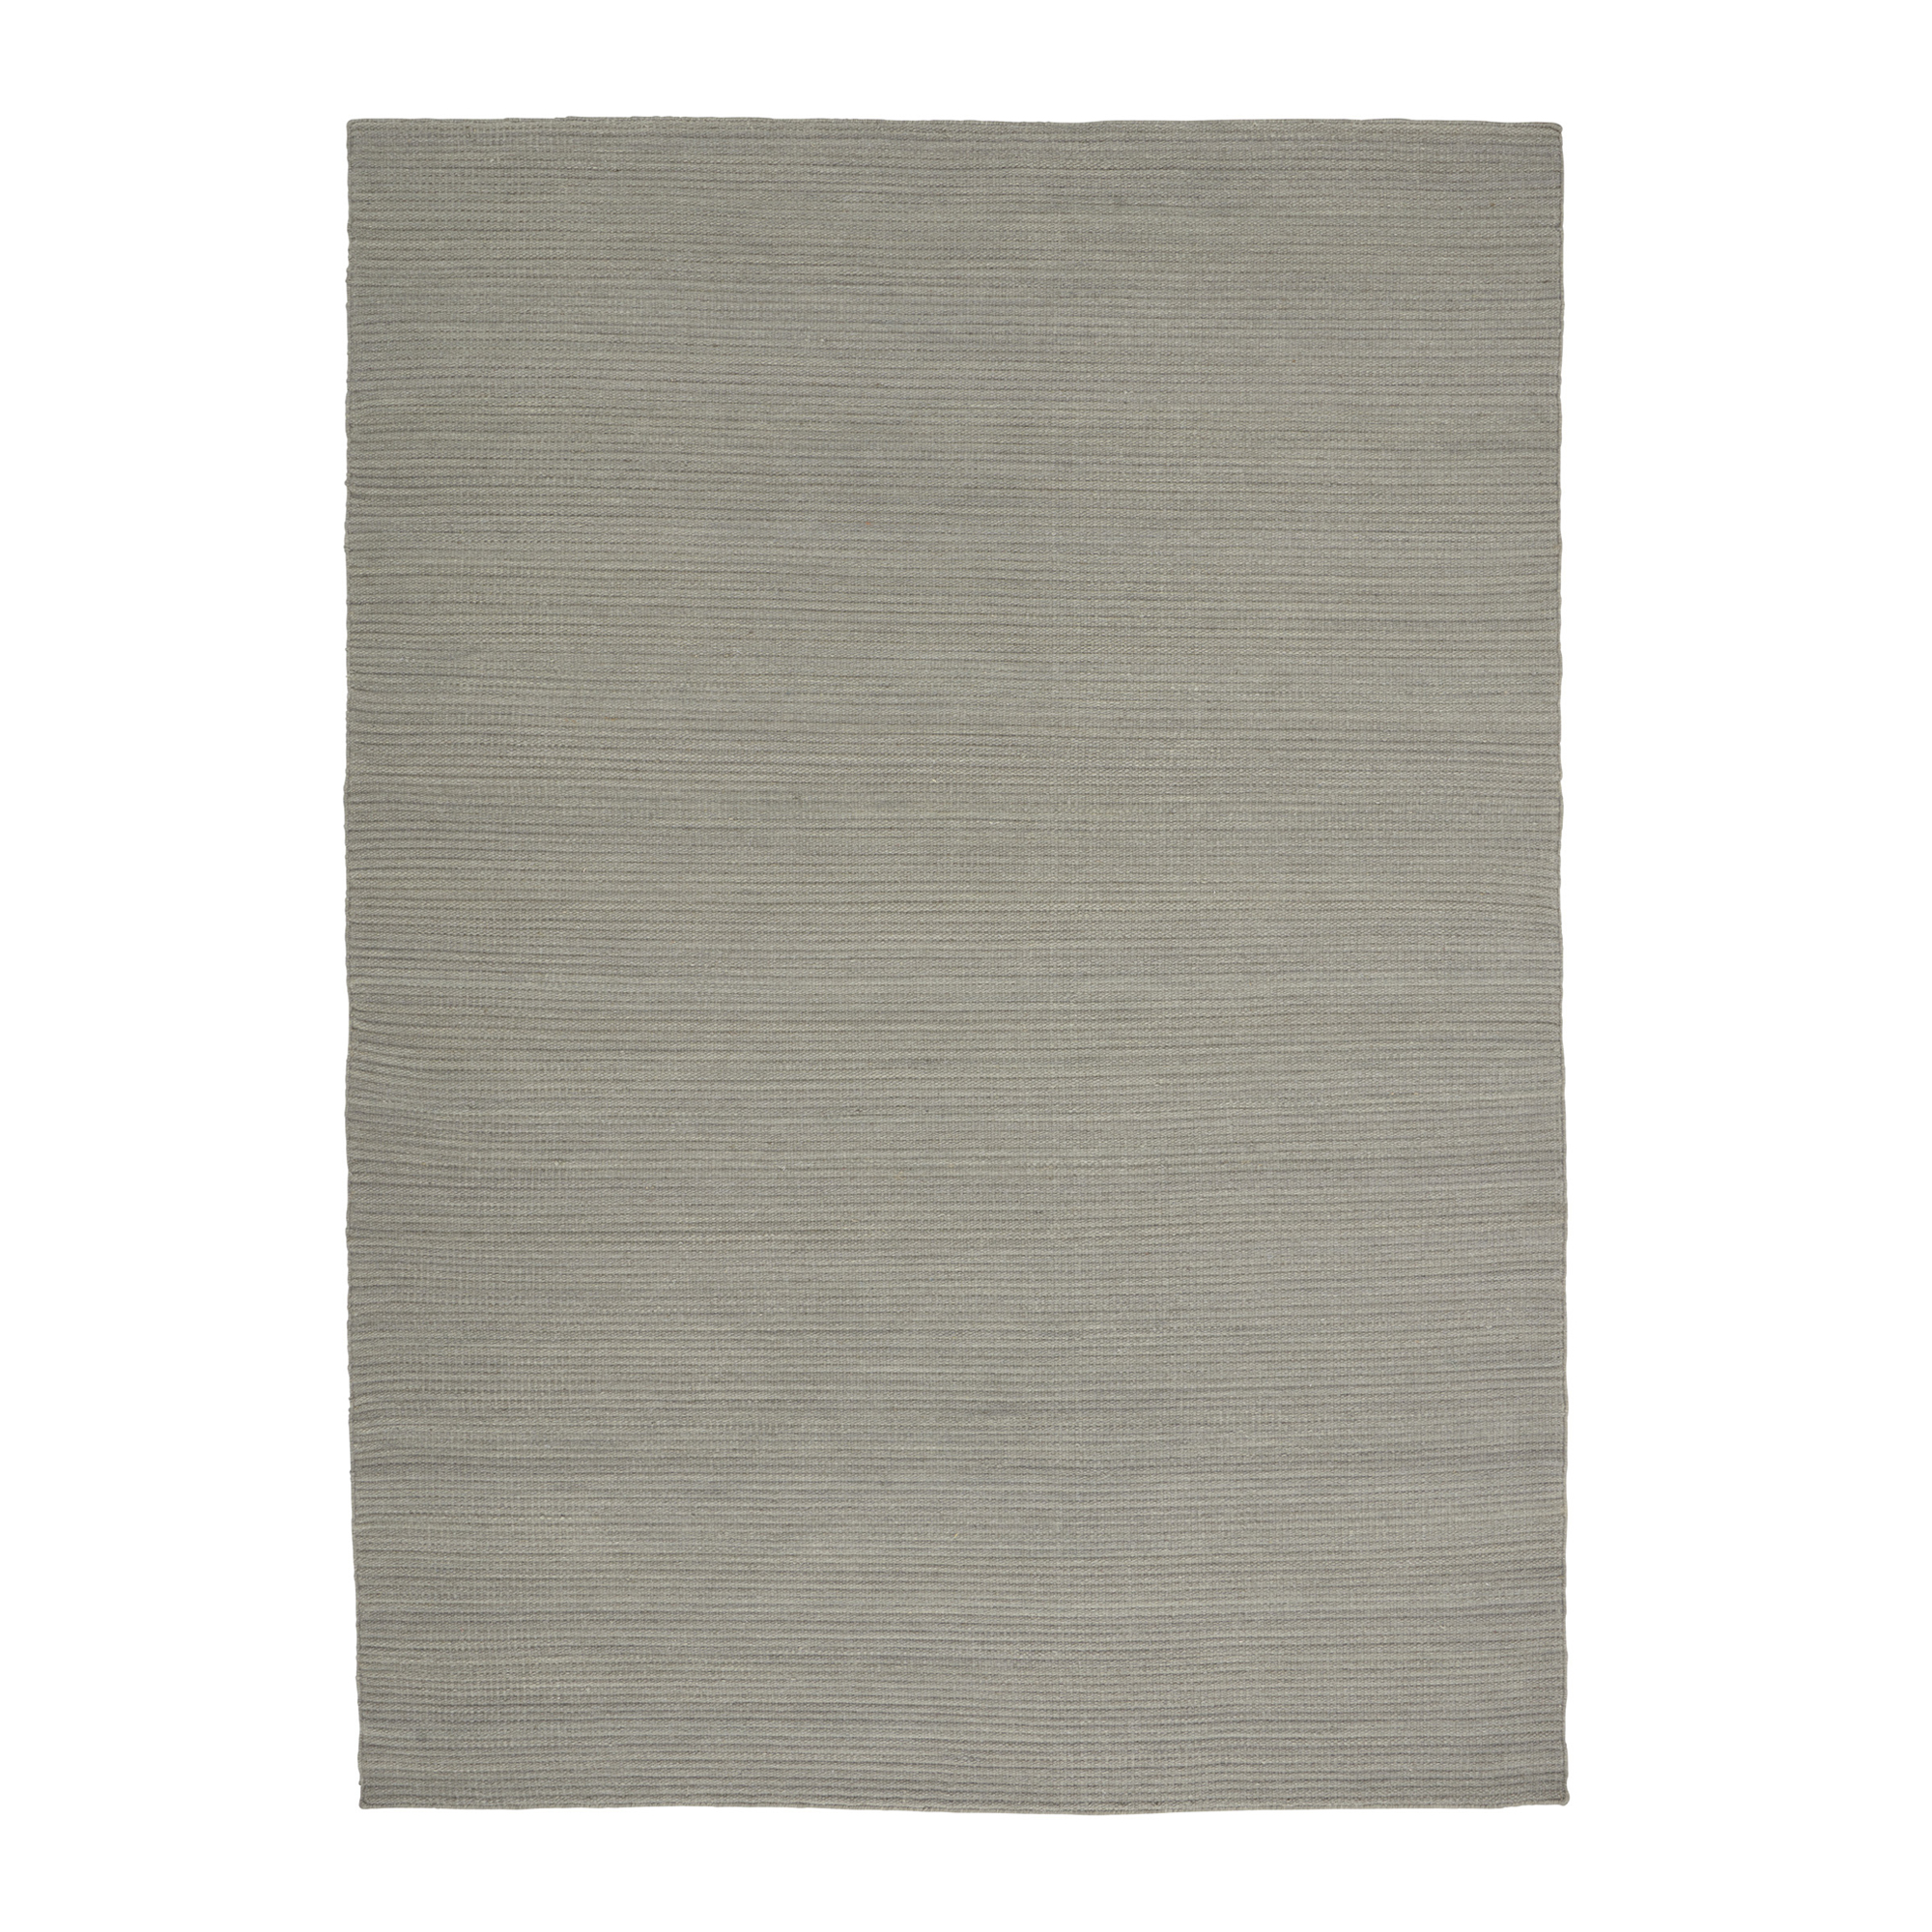 Ullmatta LIVELLO 140 x 200 cm grå, Linie Design